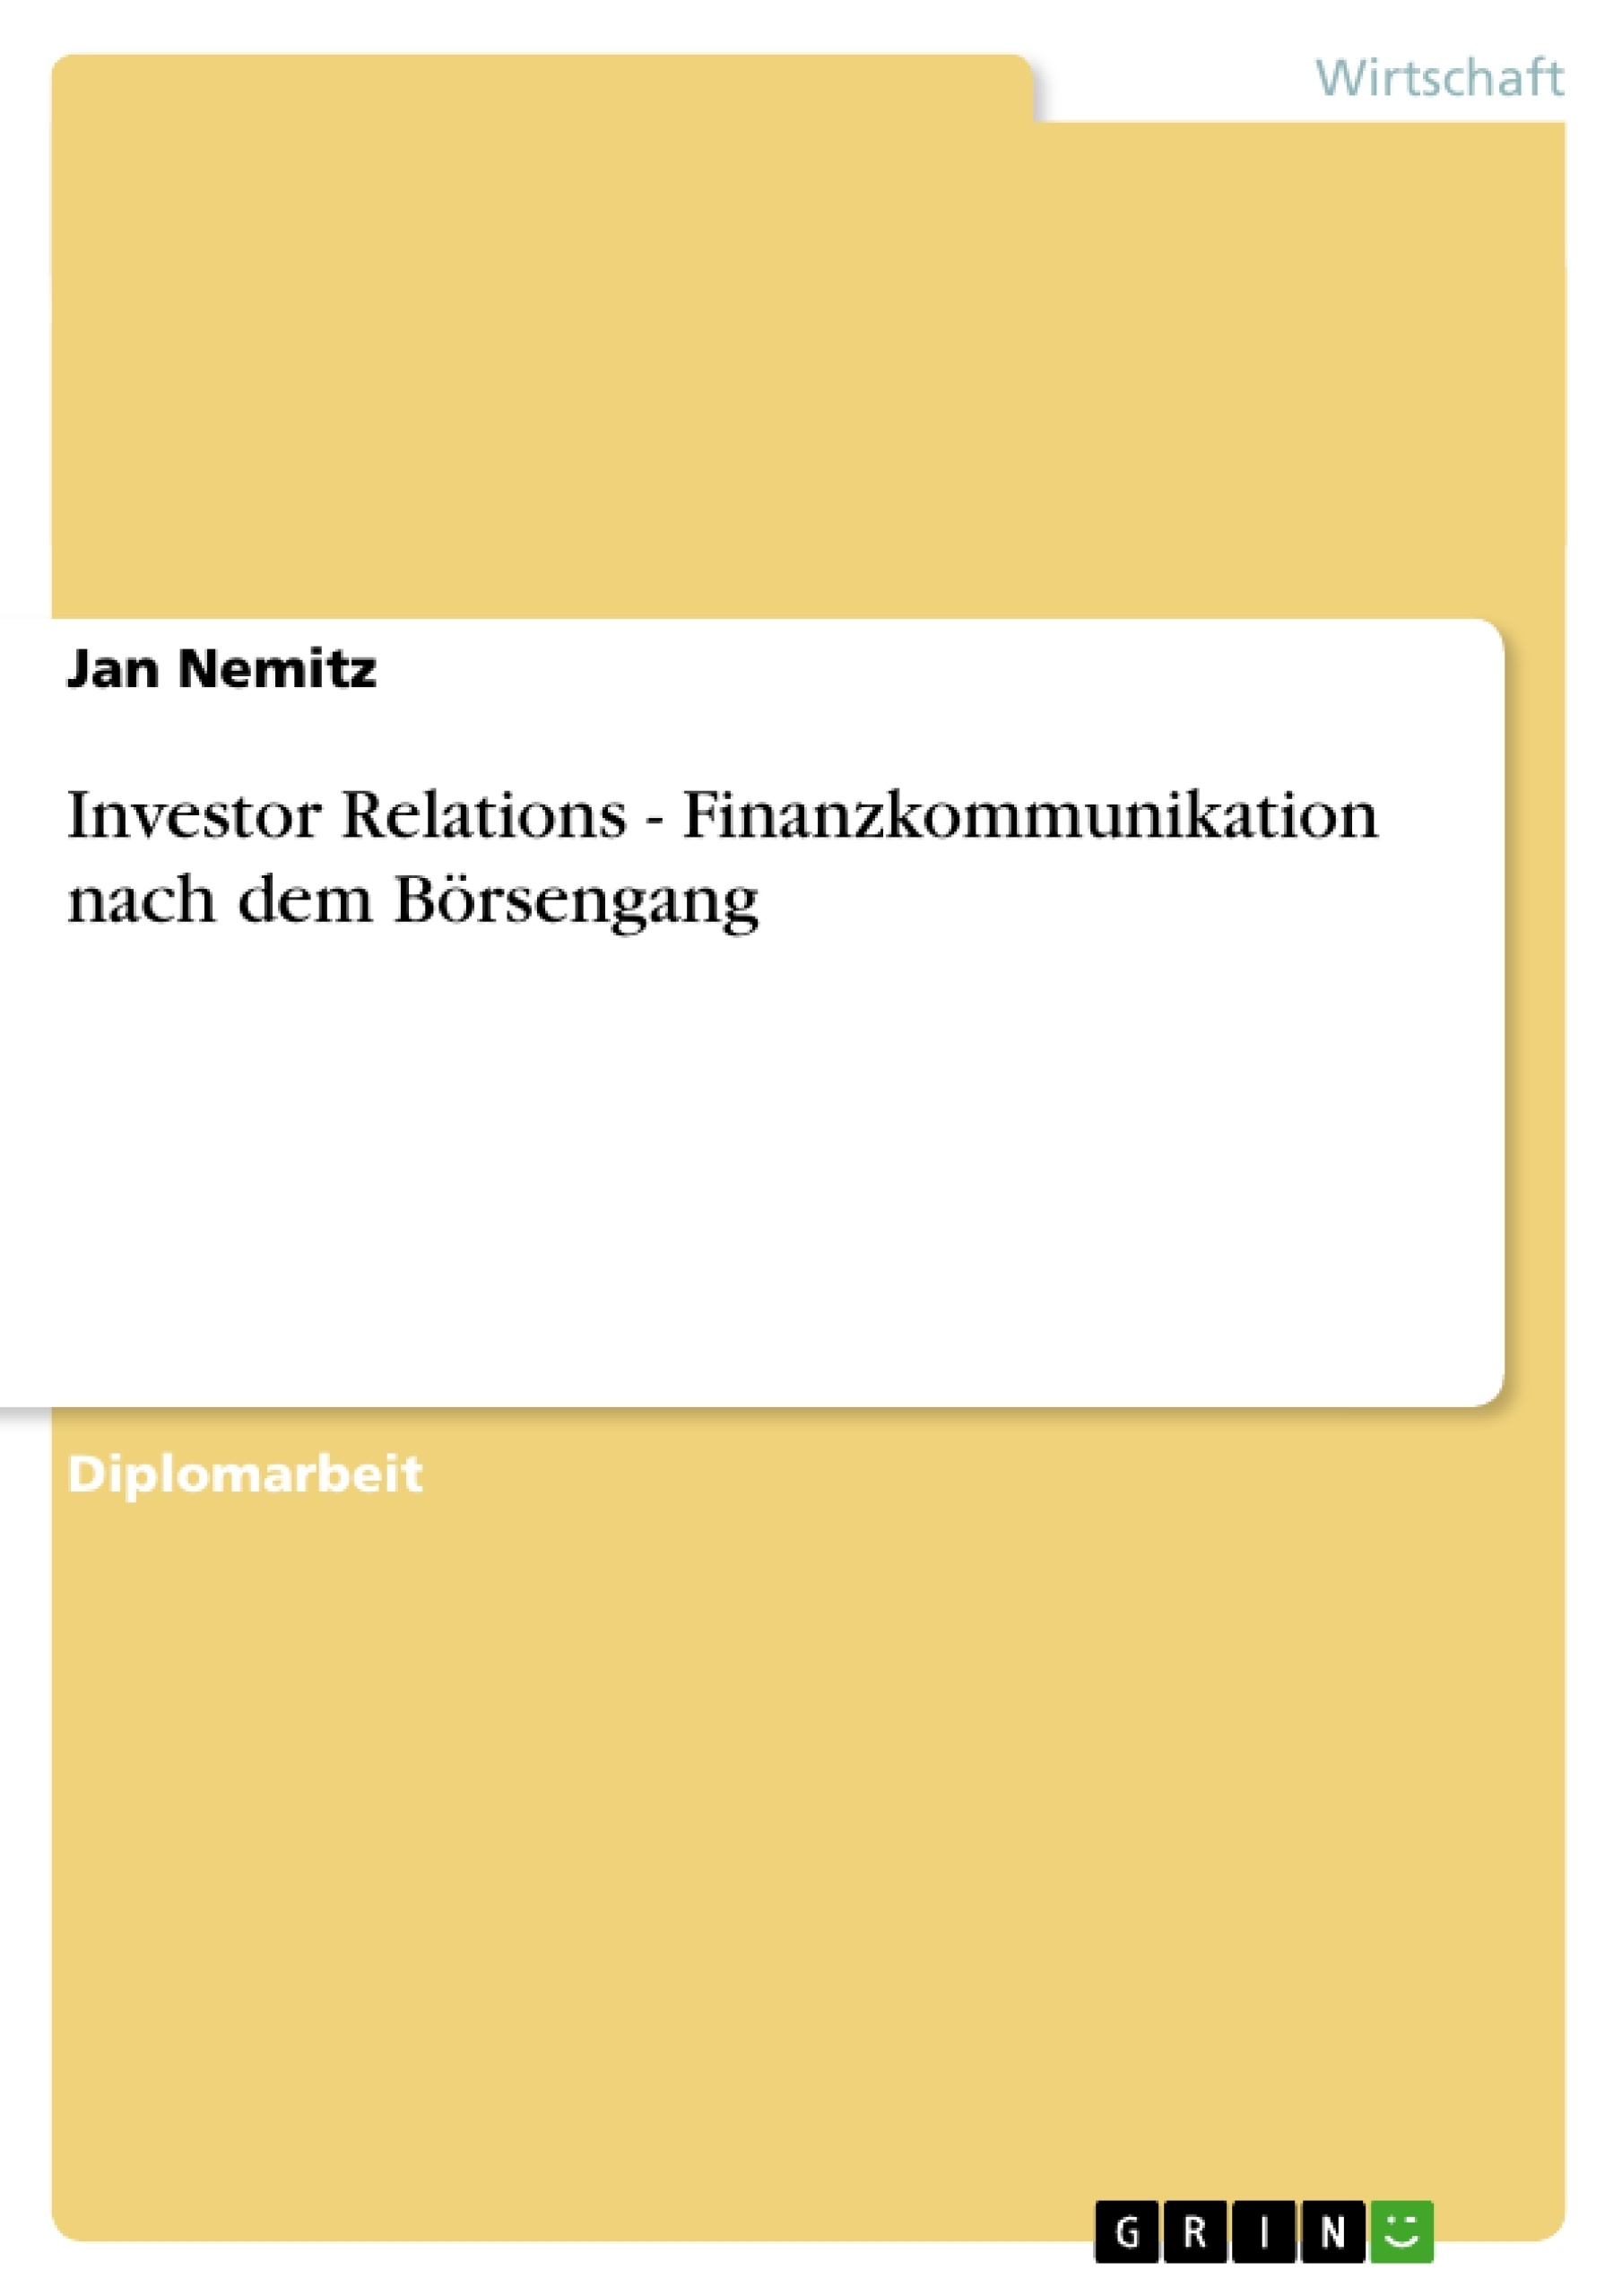 Titel: Investor Relations - Finanzkommunikation nach dem Börsengang